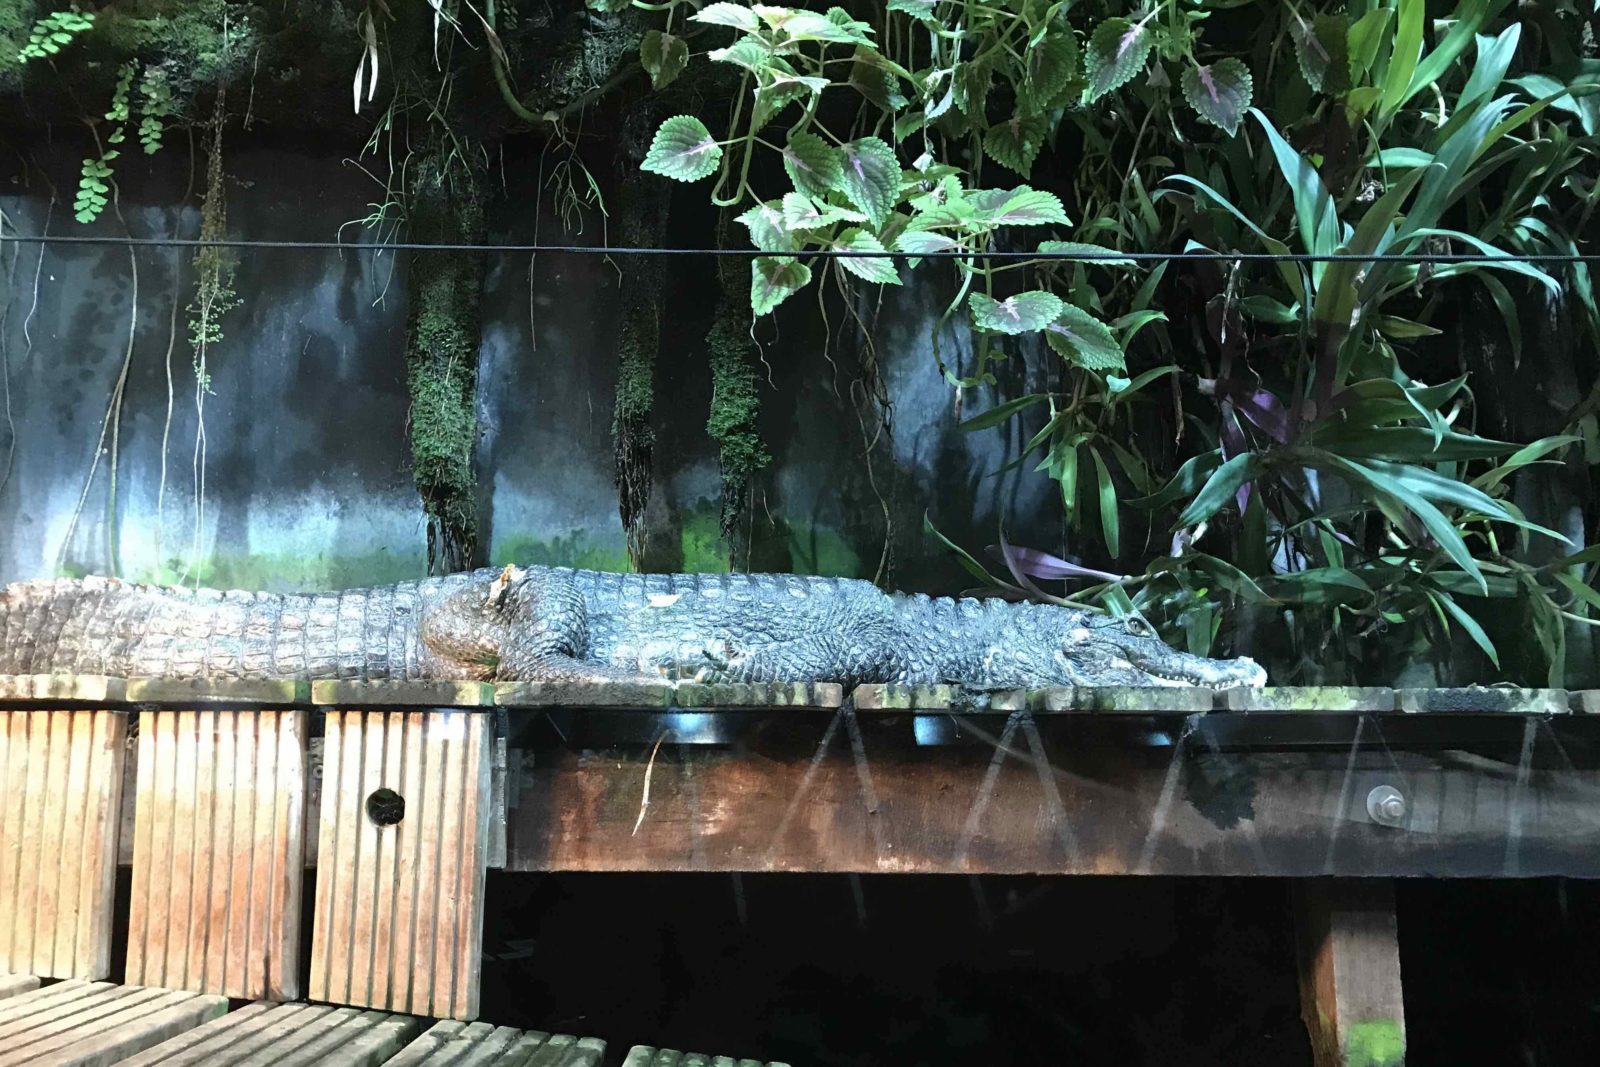 Nausicaa Boulogne-sur-Mer alligator